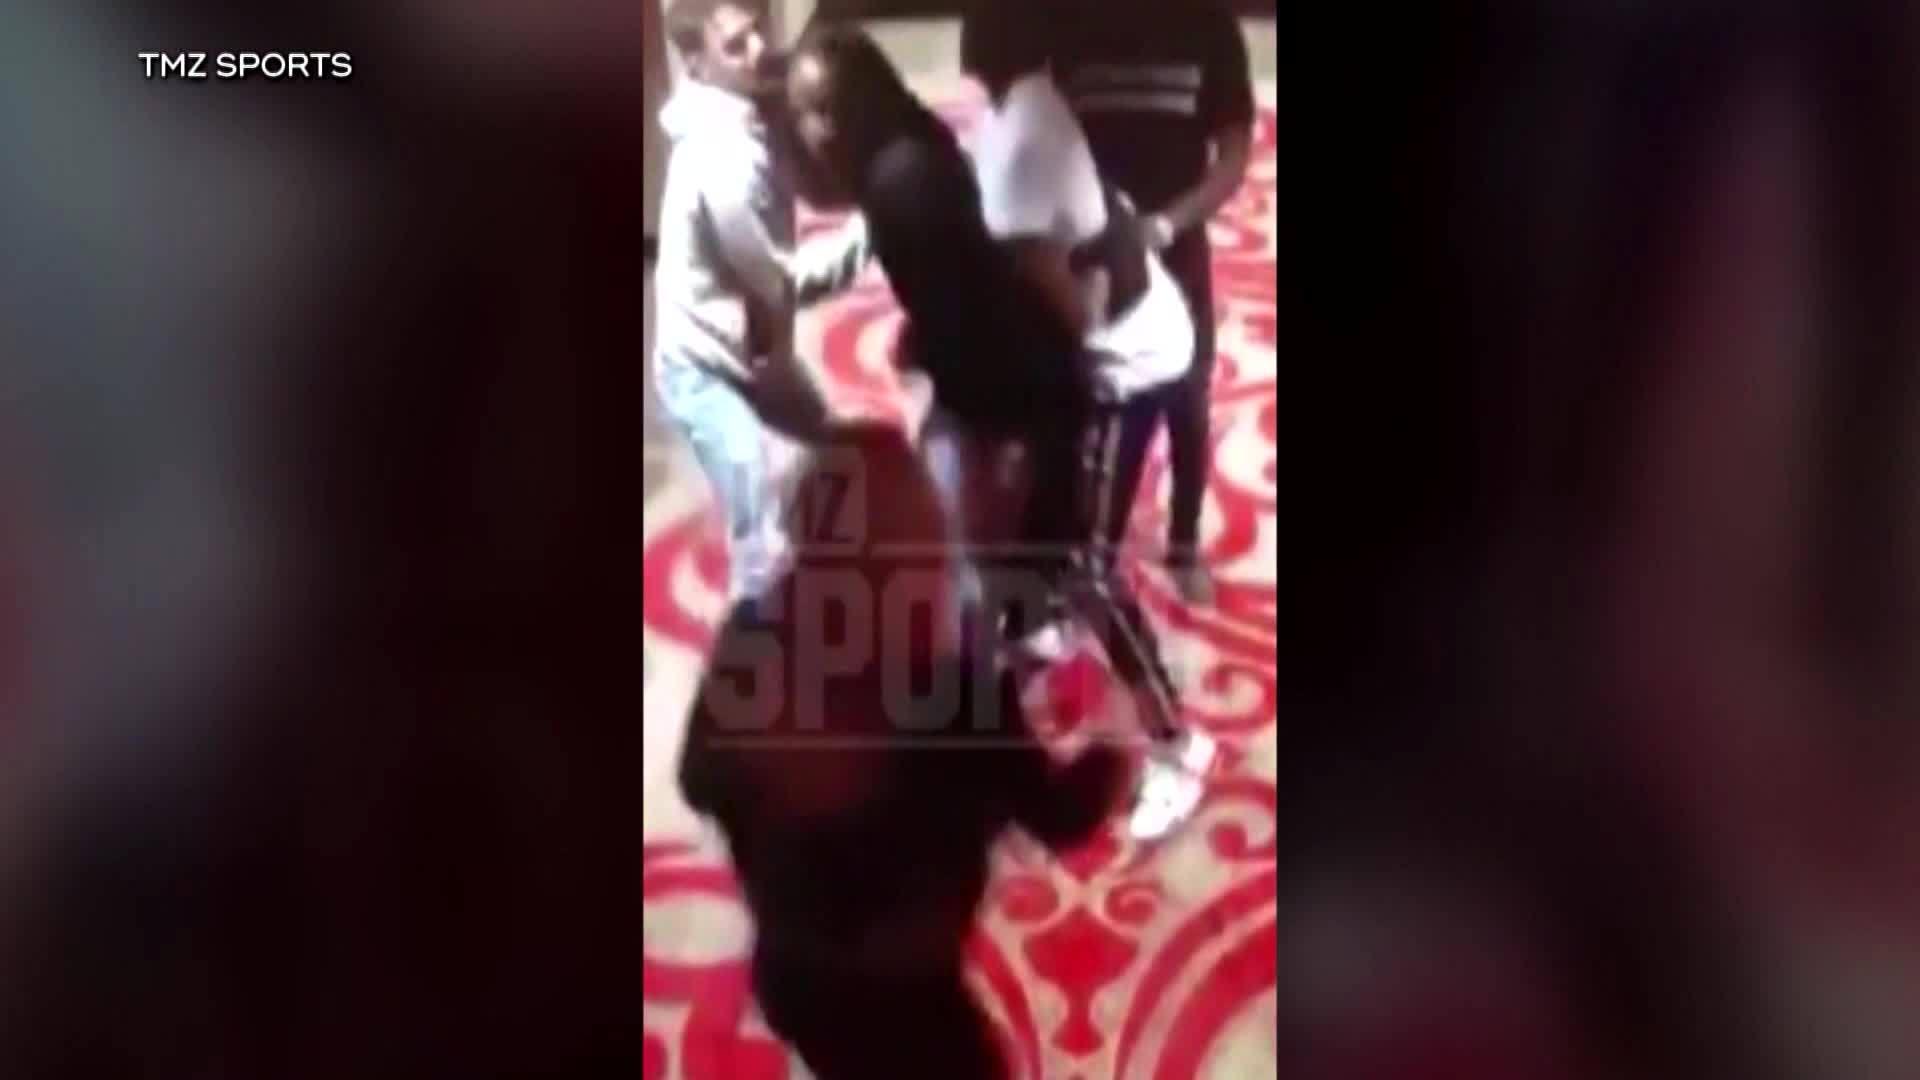 Chiefs cut Kareem Hunt after video surfaces showing alleged assault